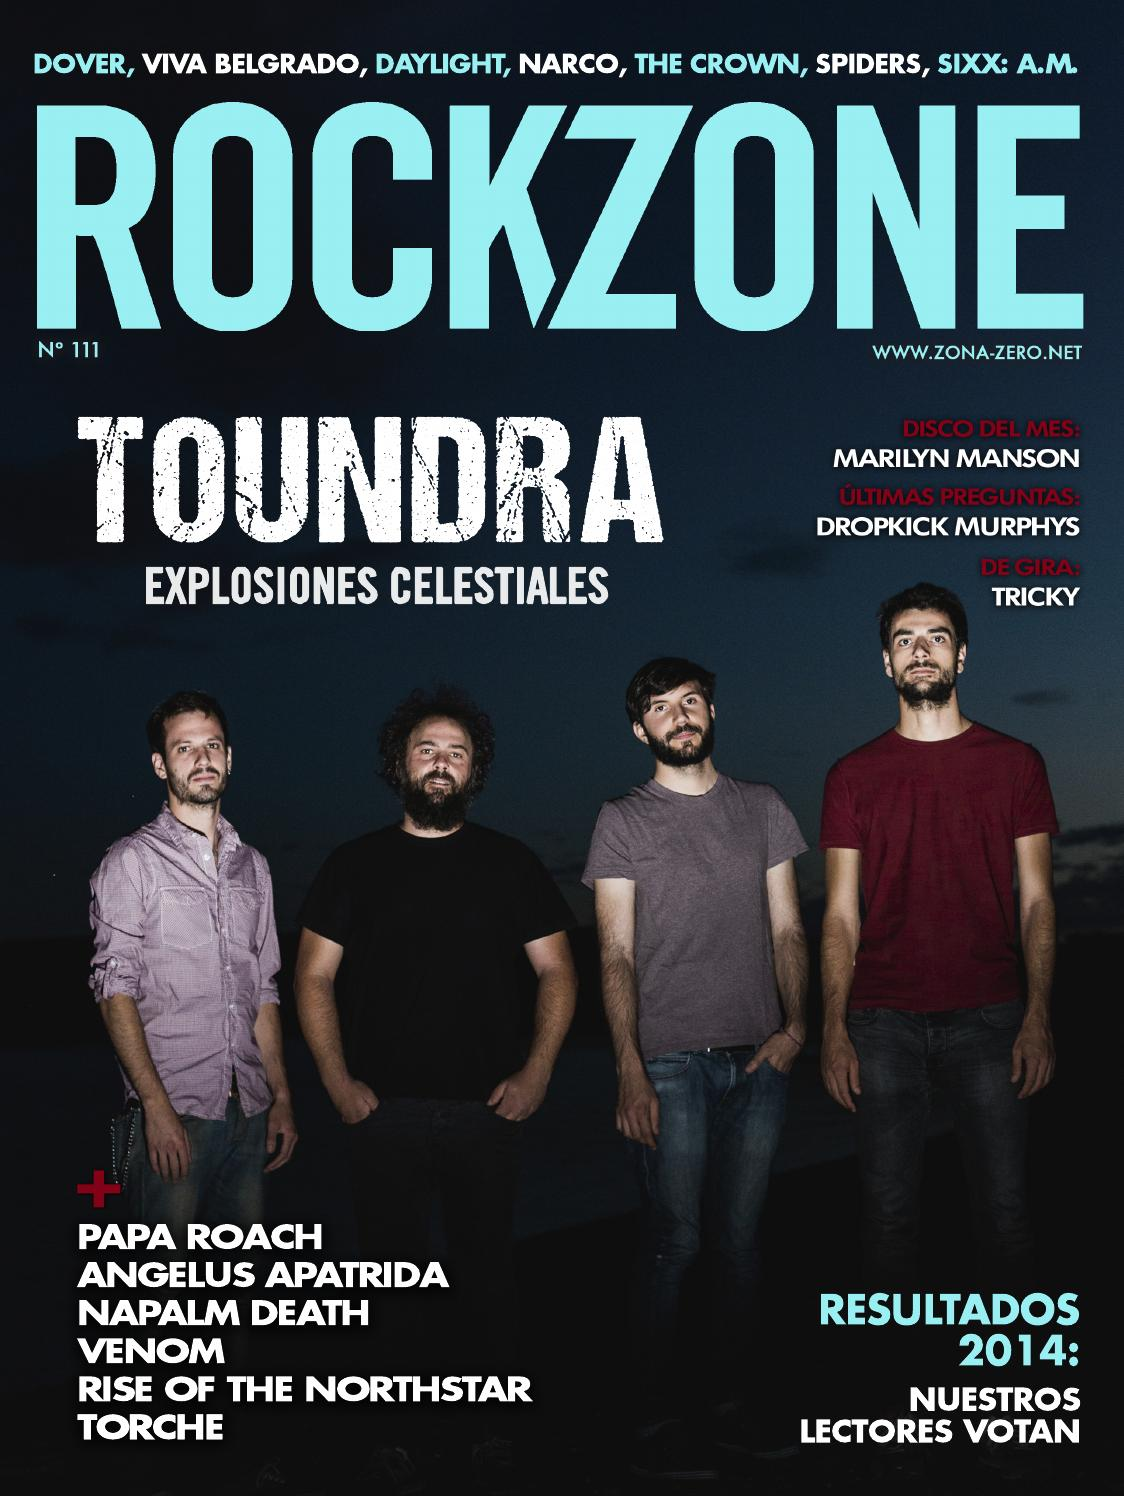 Rockzone 111 02 2015 By Rockzone Issuu